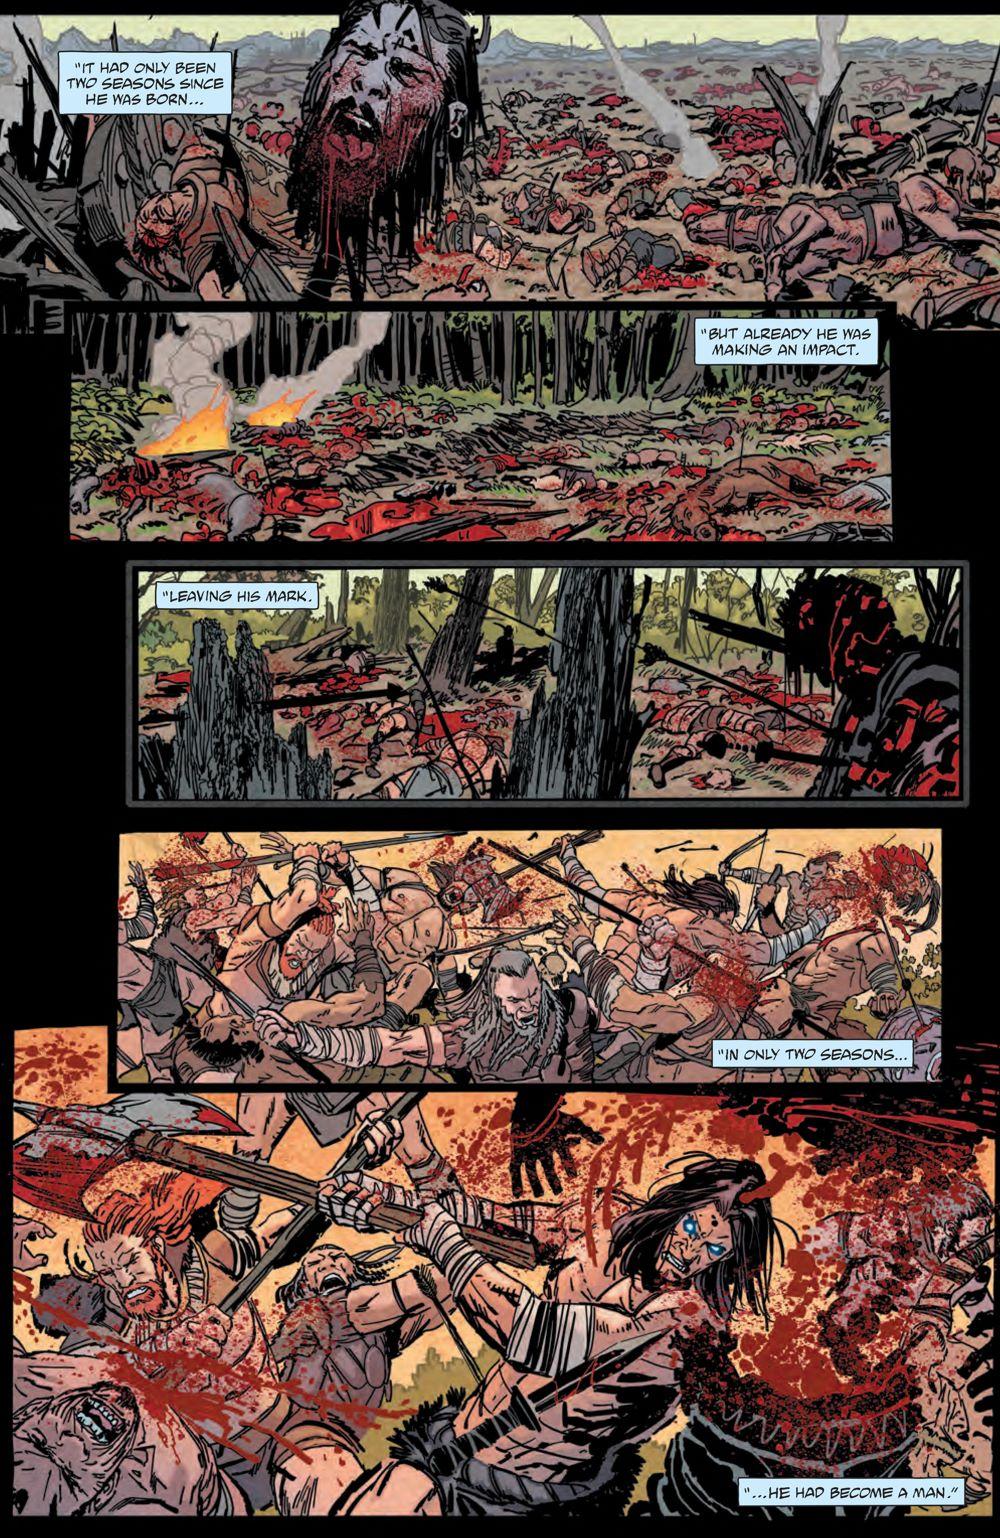 BRZRKR_003_PRESS_3 ComicList Previews: BRZRKR #3 (OF 12)